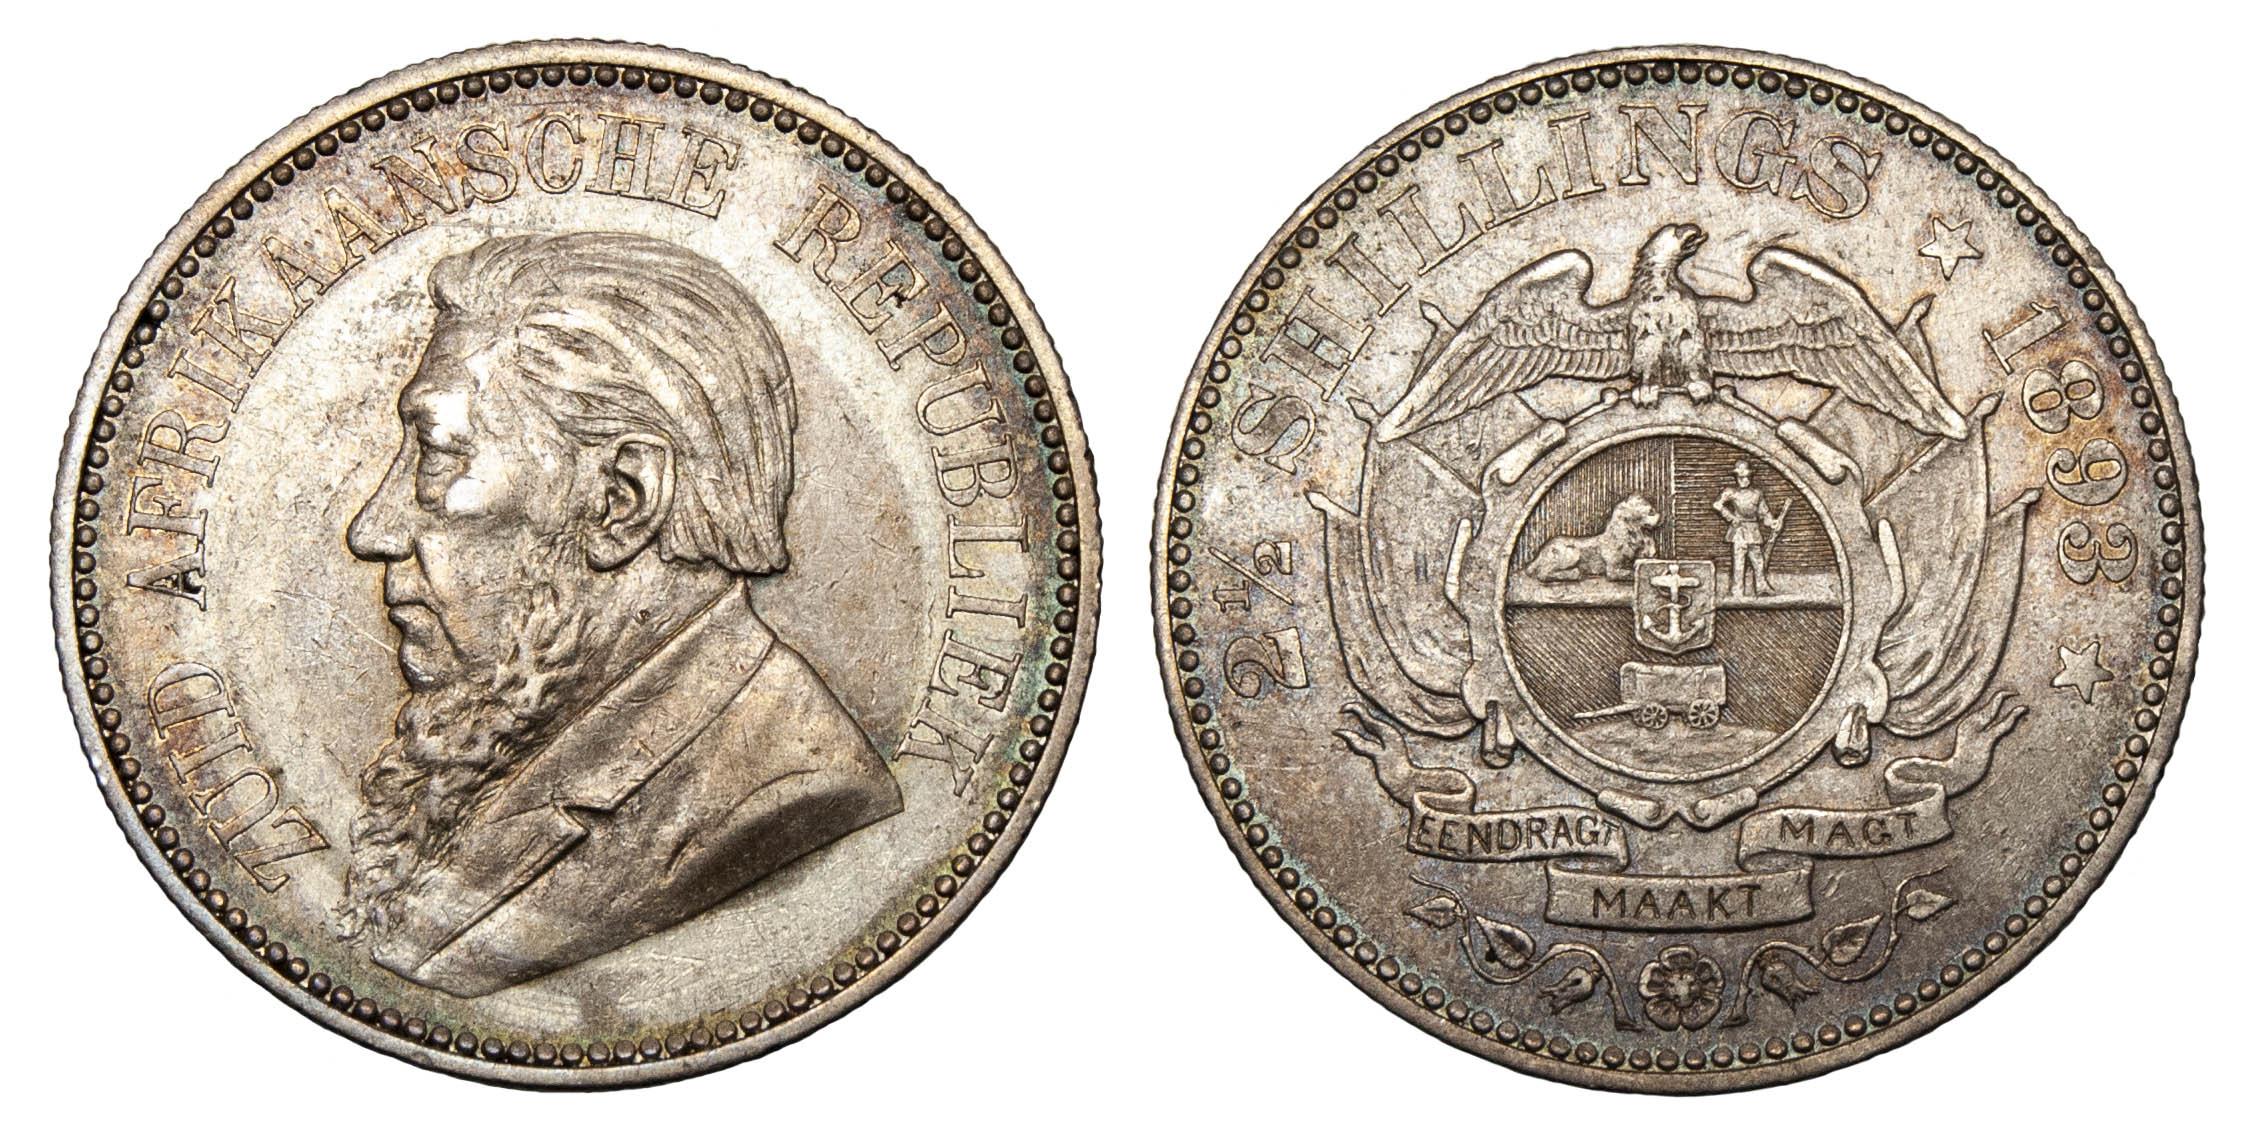 South Africa, Paul Kruger, silver Halfcrown, 1893